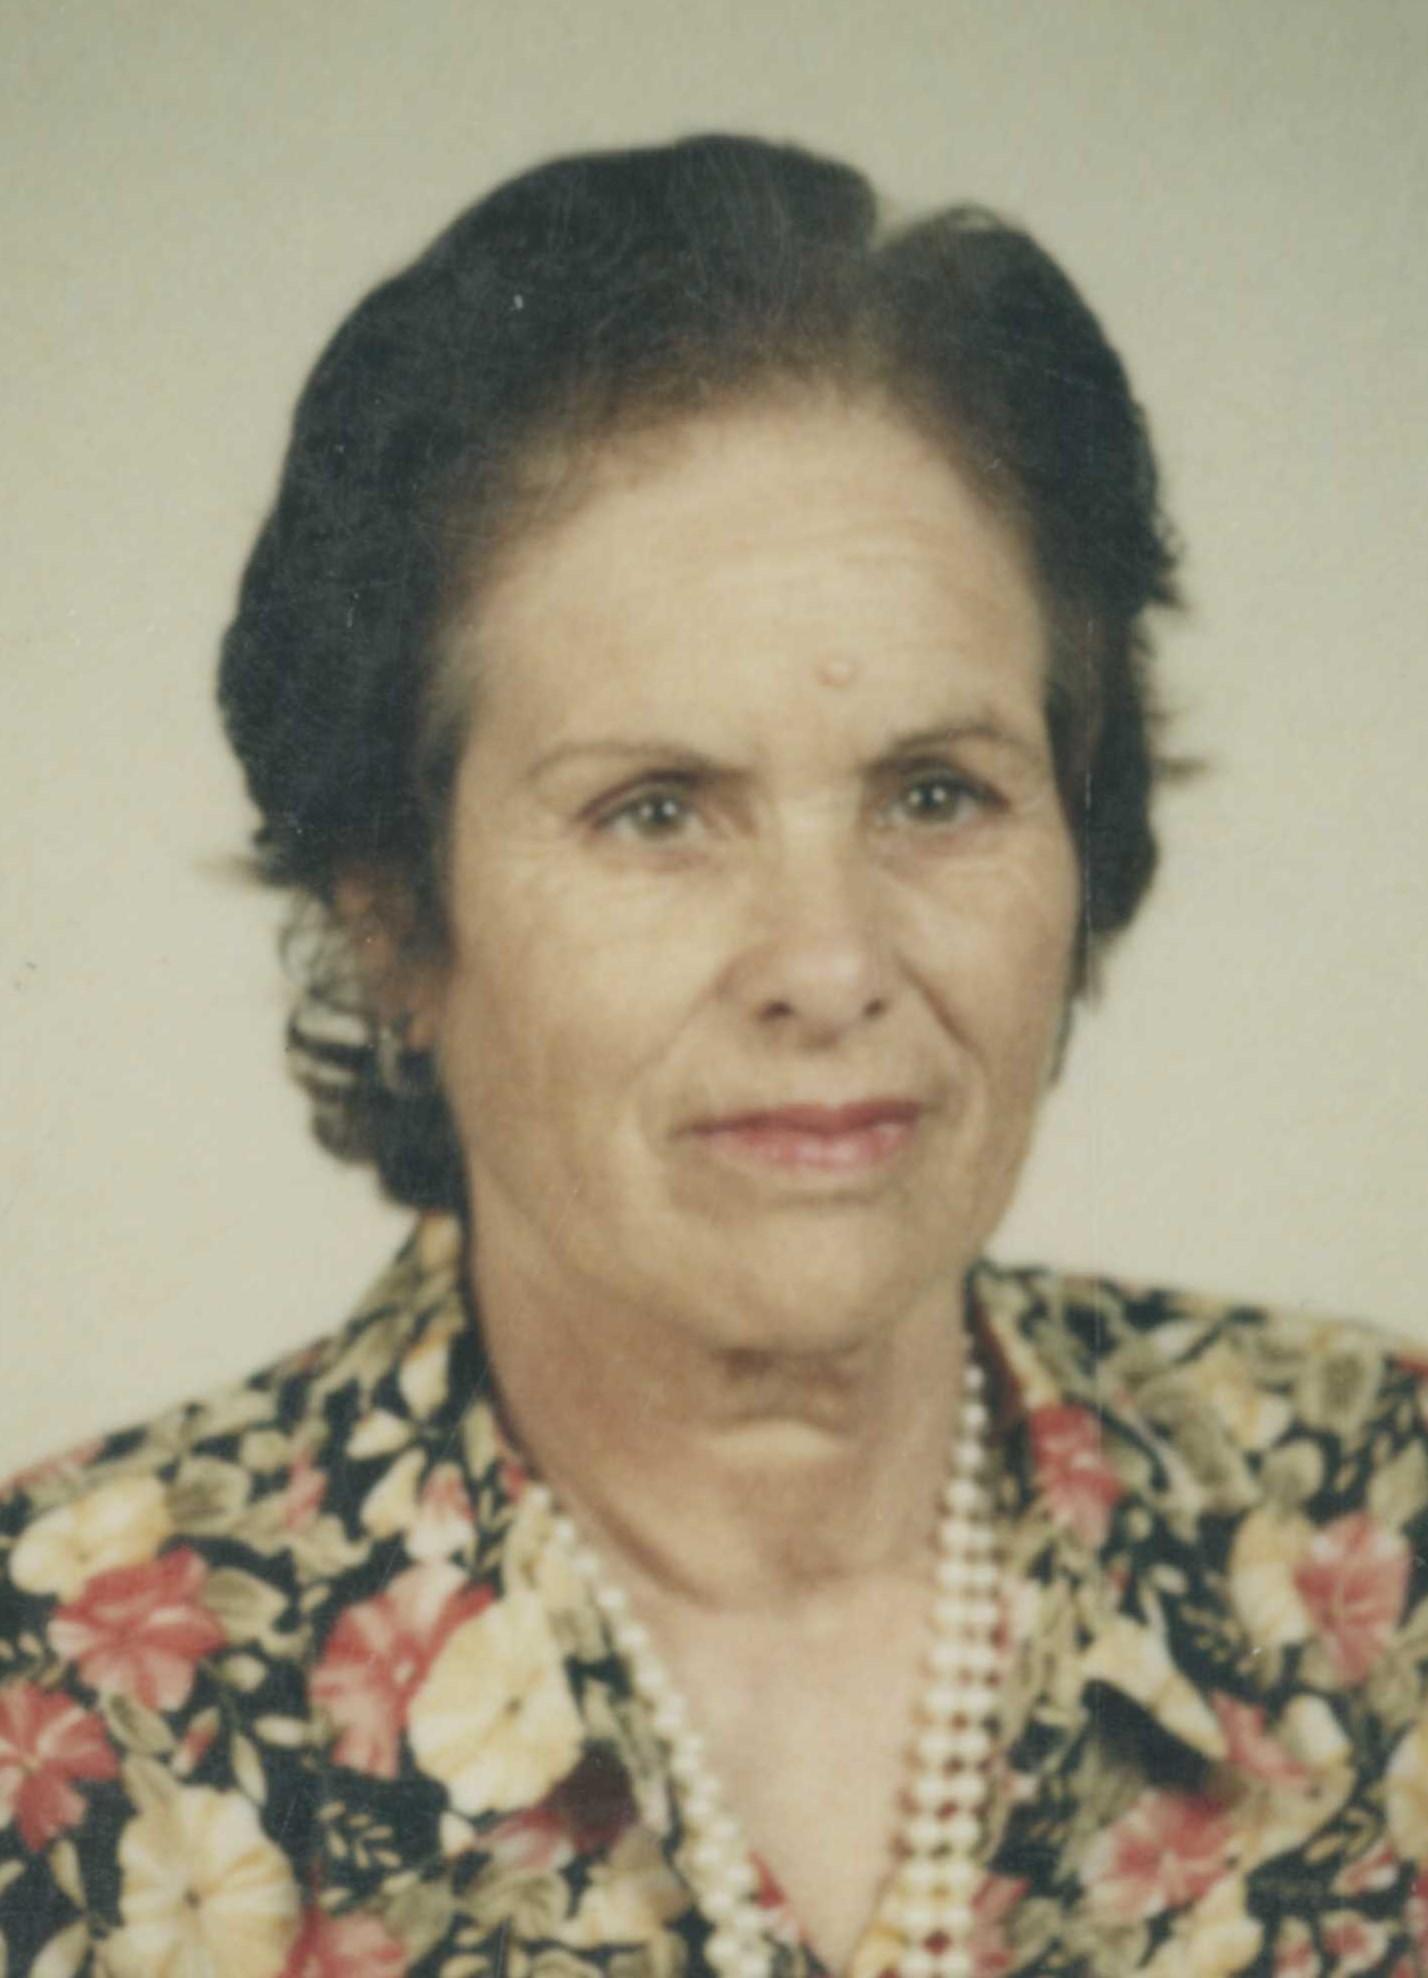 Maria Nobre de Brito